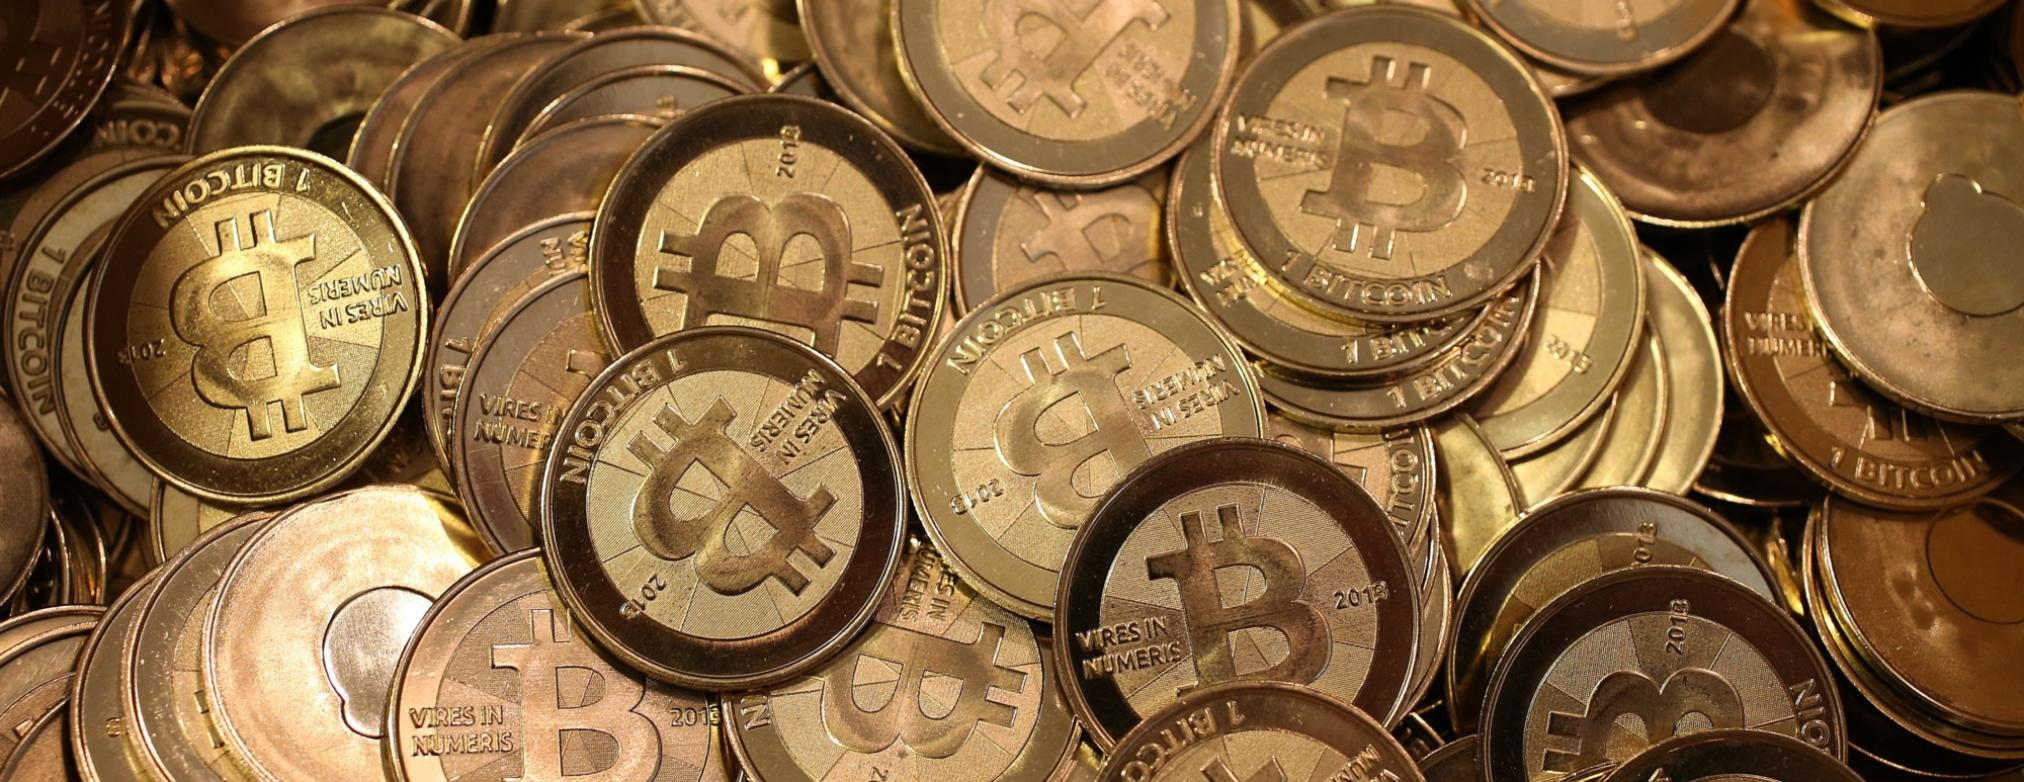 physical representation of bitcoins